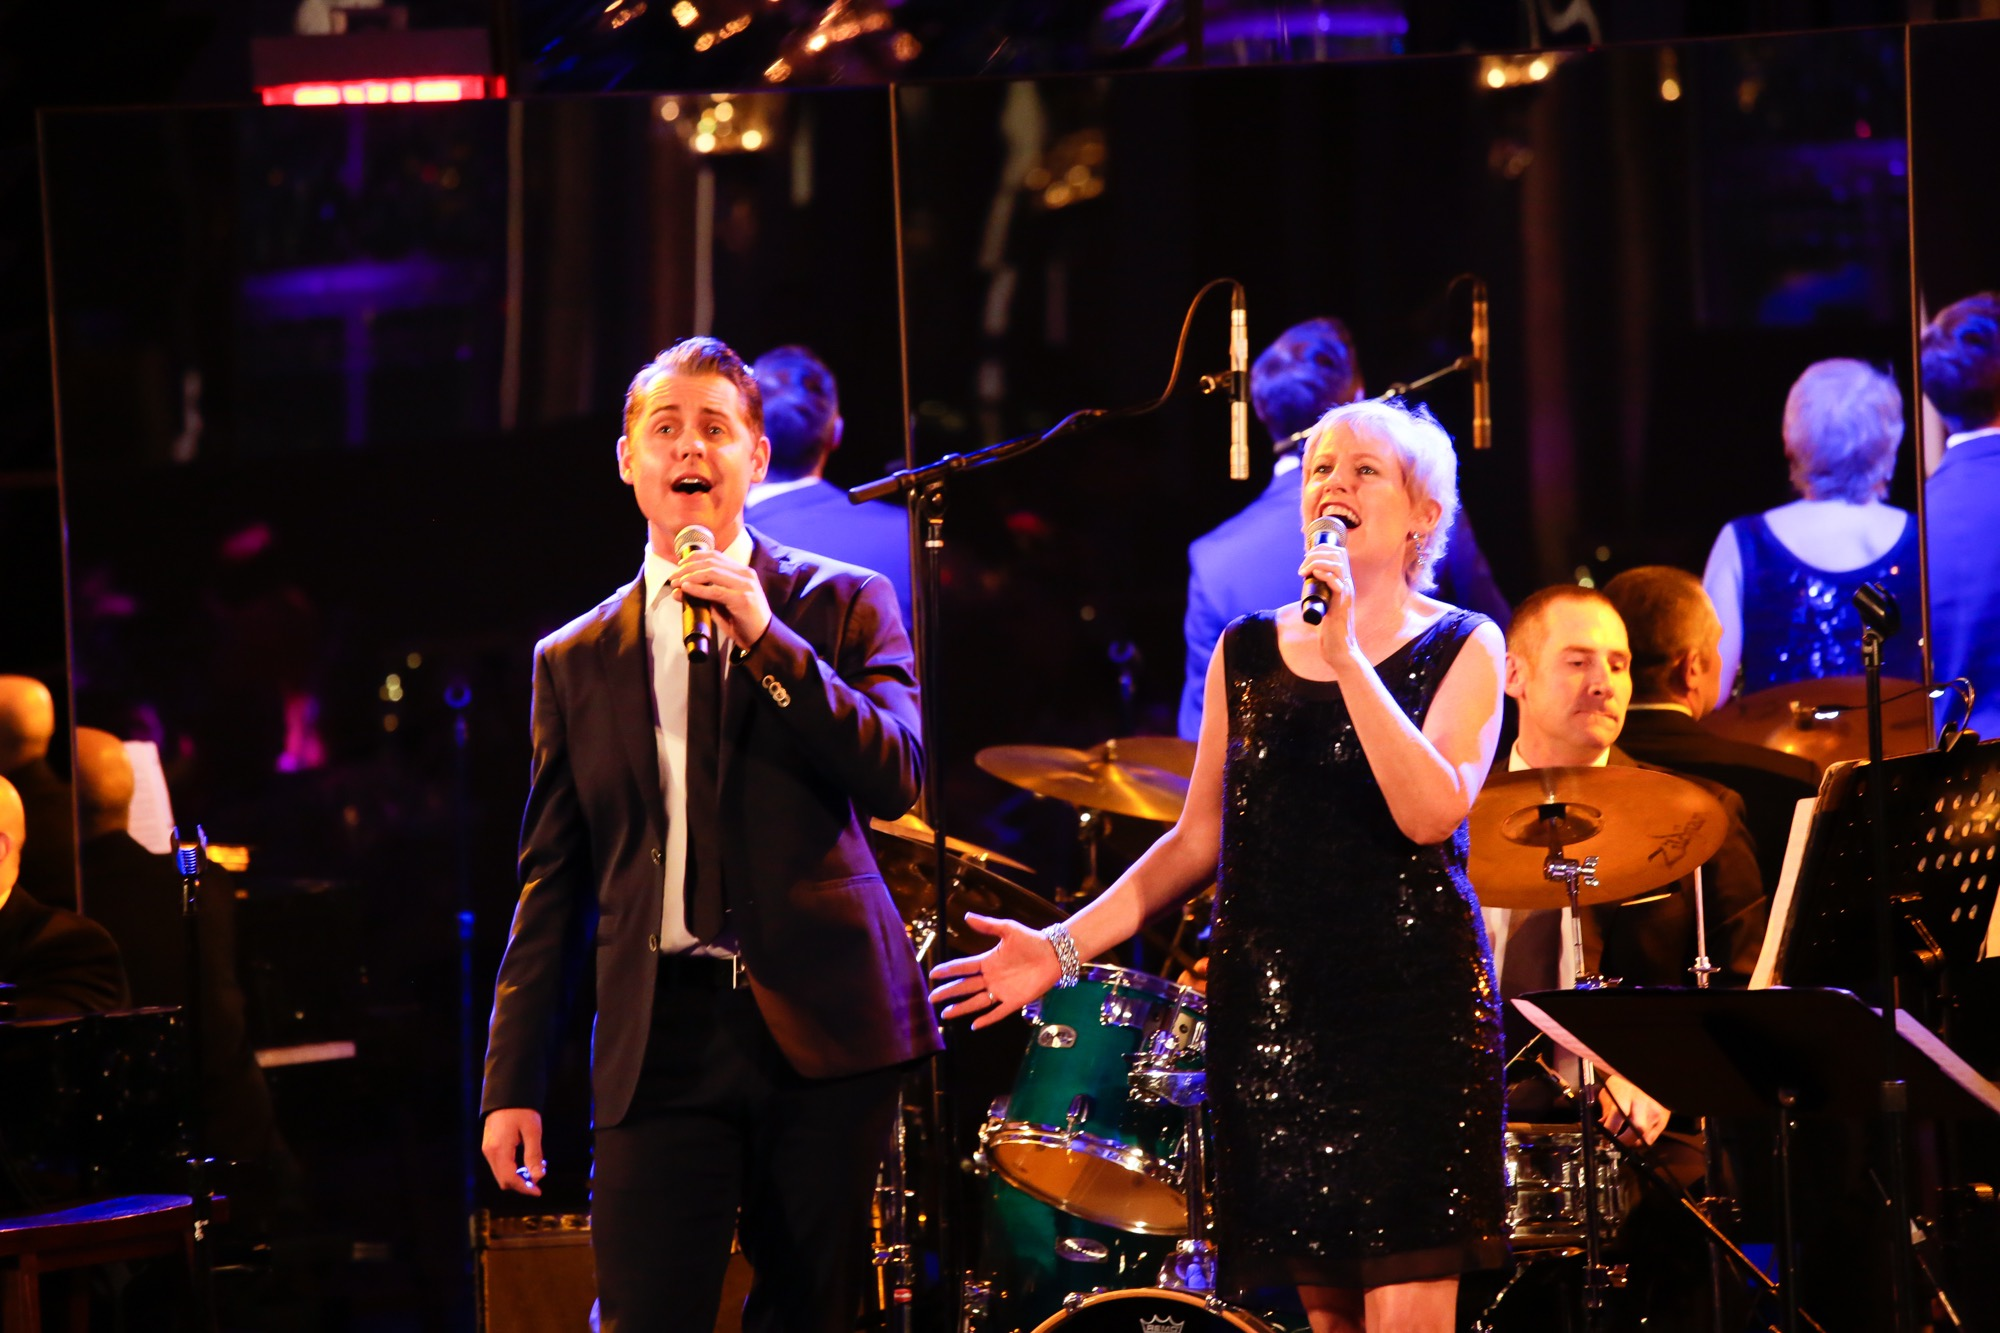 Michael and Liz Callaway at The Rainbow Room; NYC.